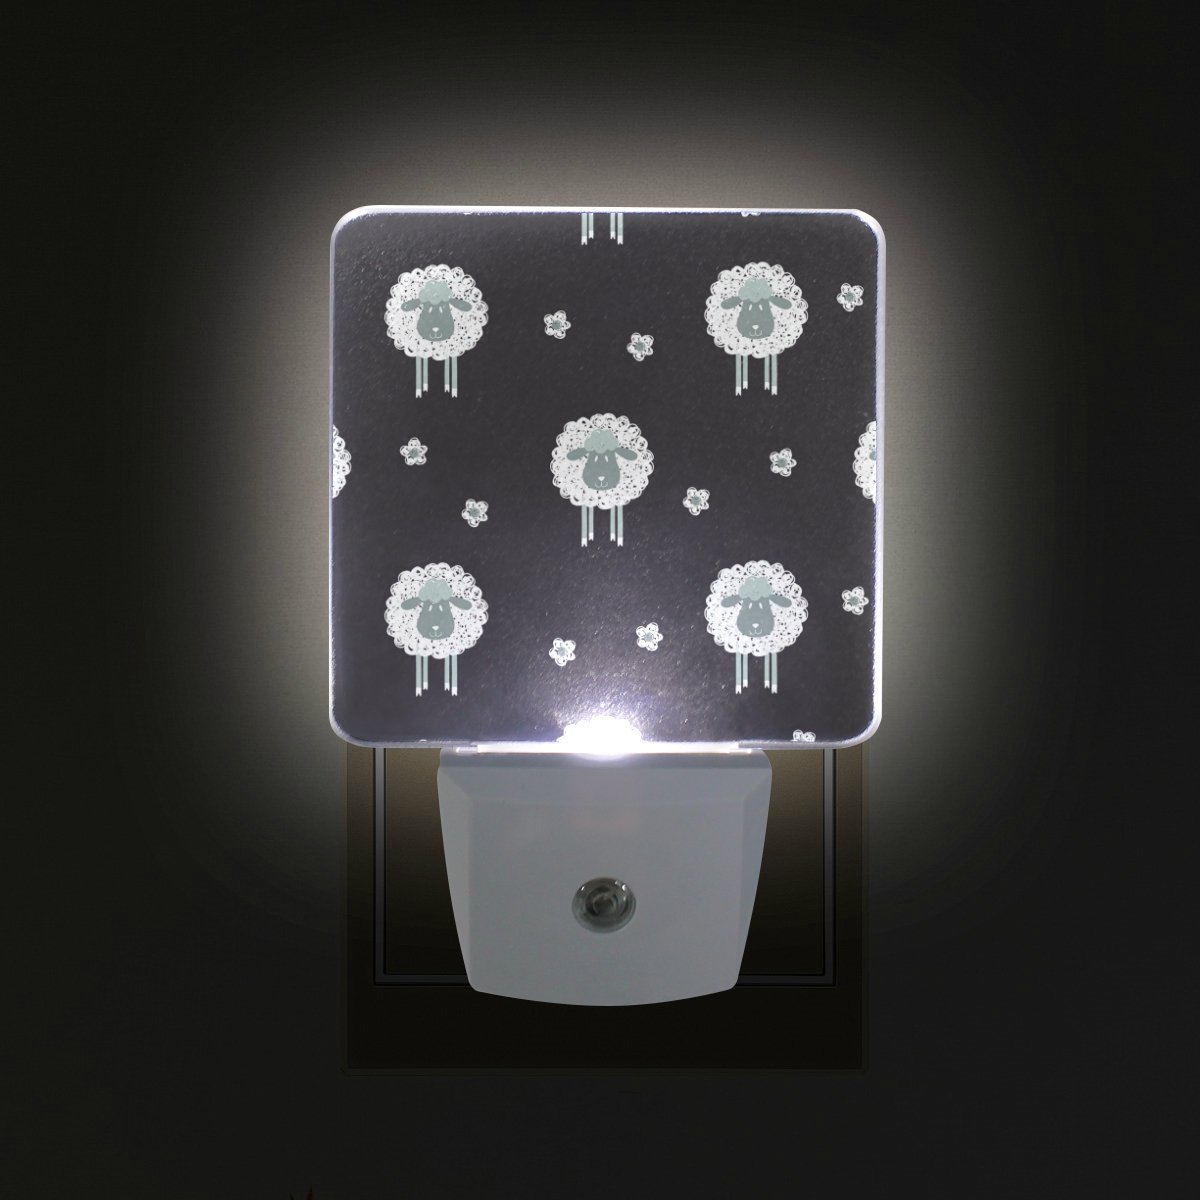 ALAZA Sheep LED Night Light with Smart Dusk to Dawn Sensor,Lamb Animal Black Plug in Night Light Great for Bedroom Bathroom Hallway Stairways Or Any Dark Room